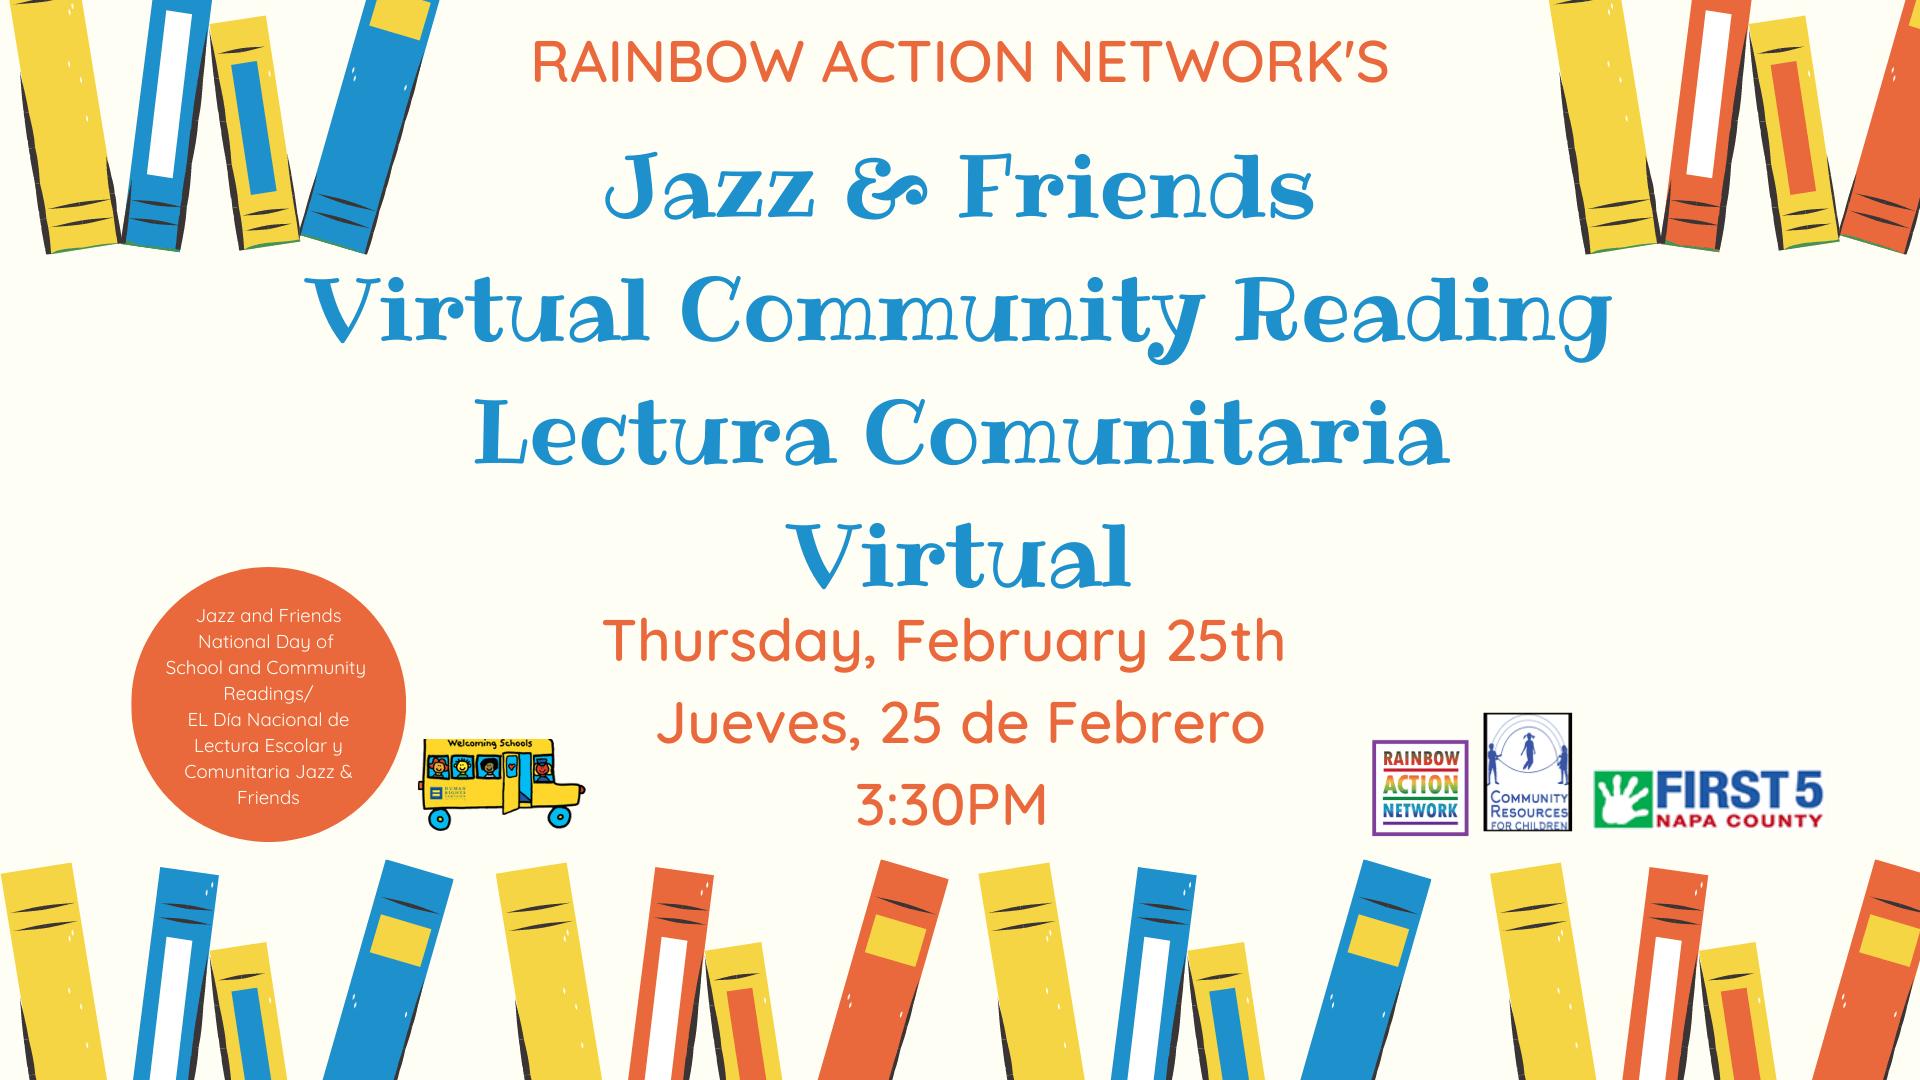 2nd Annual RAN Jazz & Friends Community Reading